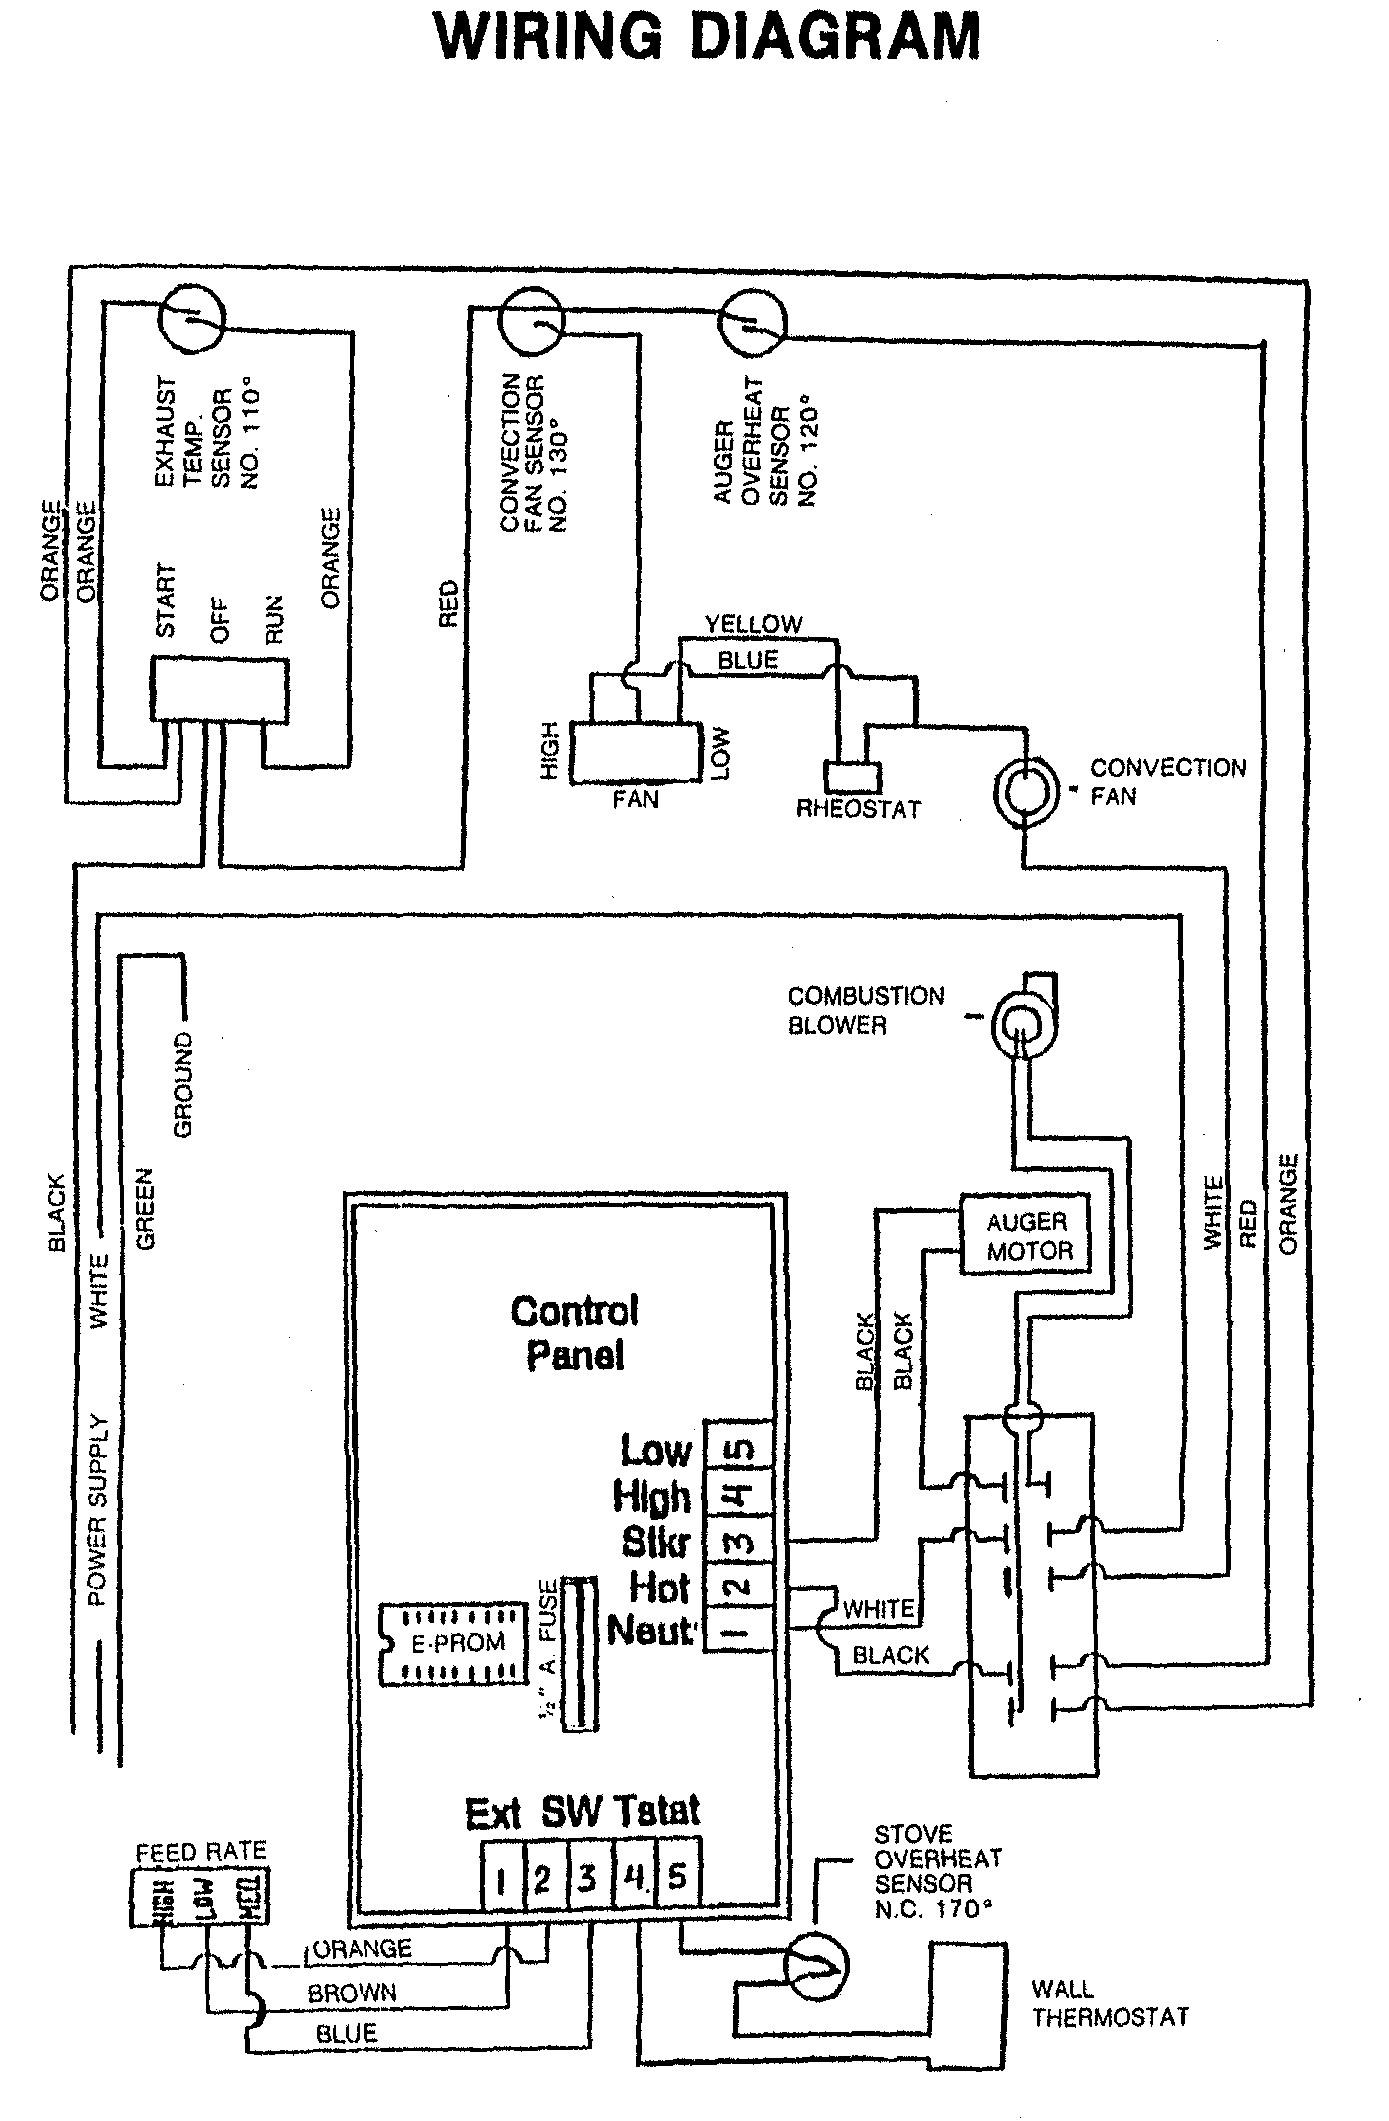 furniture whip electrical wiring diagram